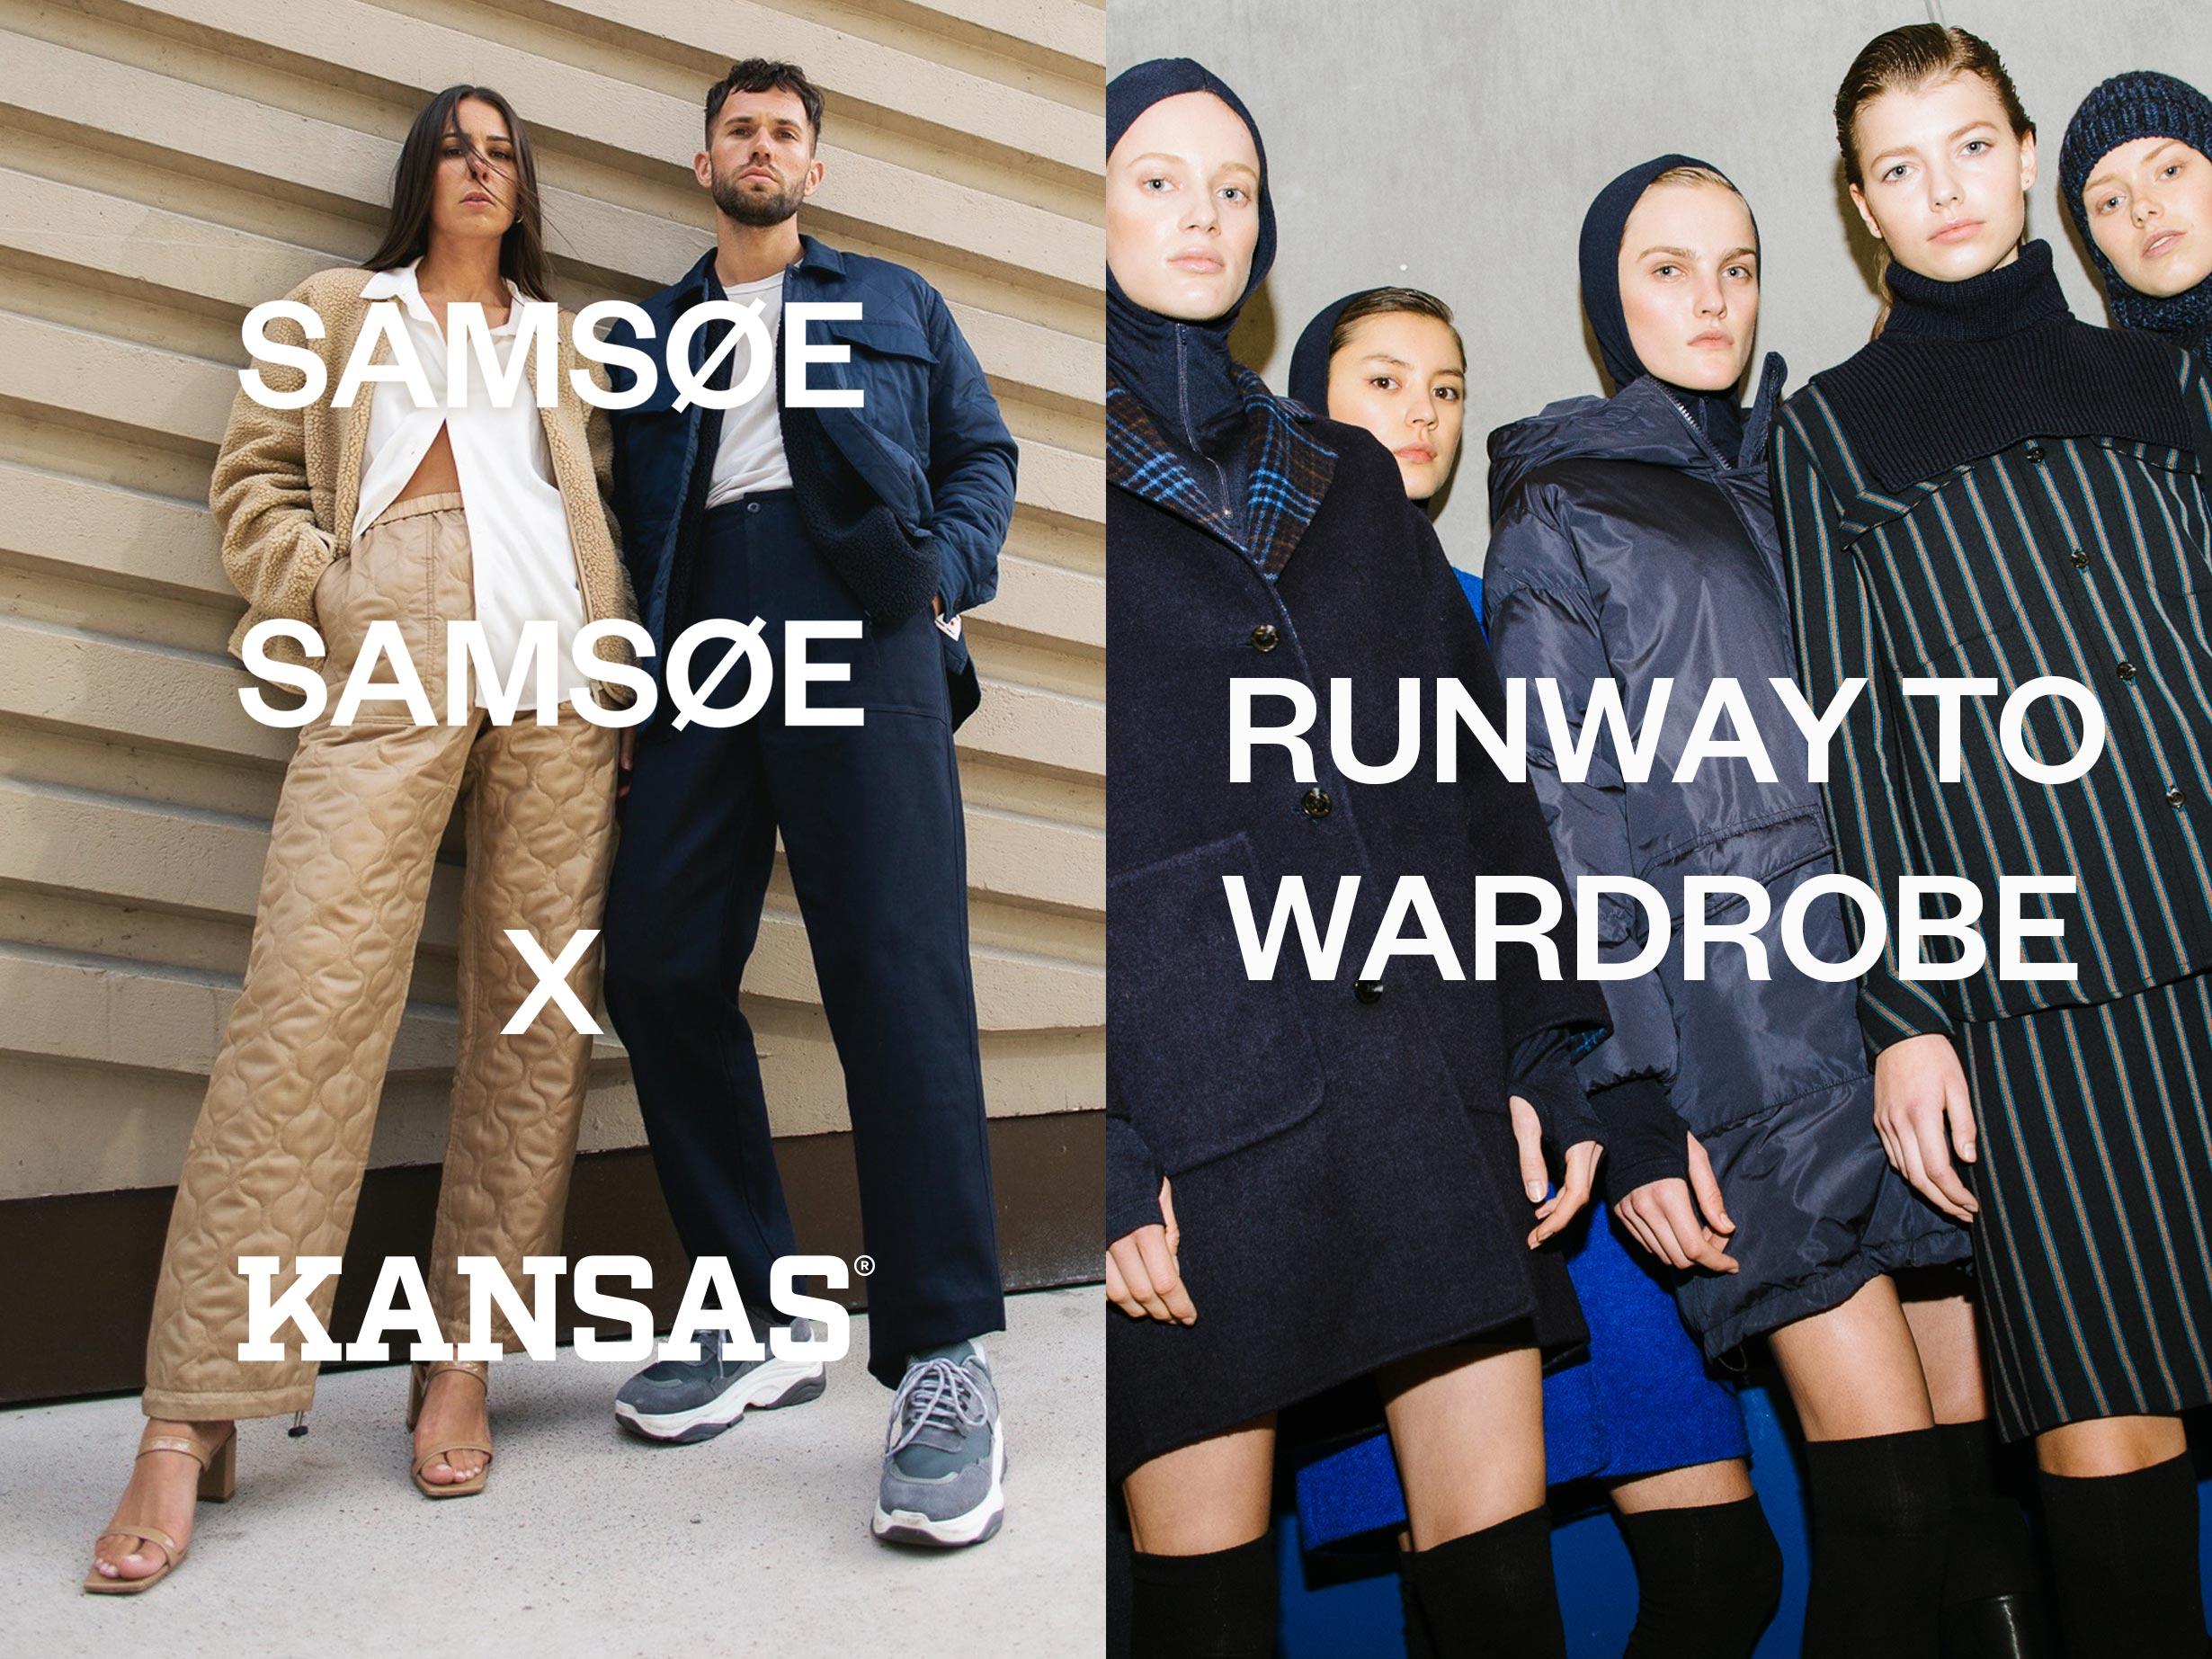 Samsøe Samsøe x Kansas collection Women's fashion and Men's Fashion